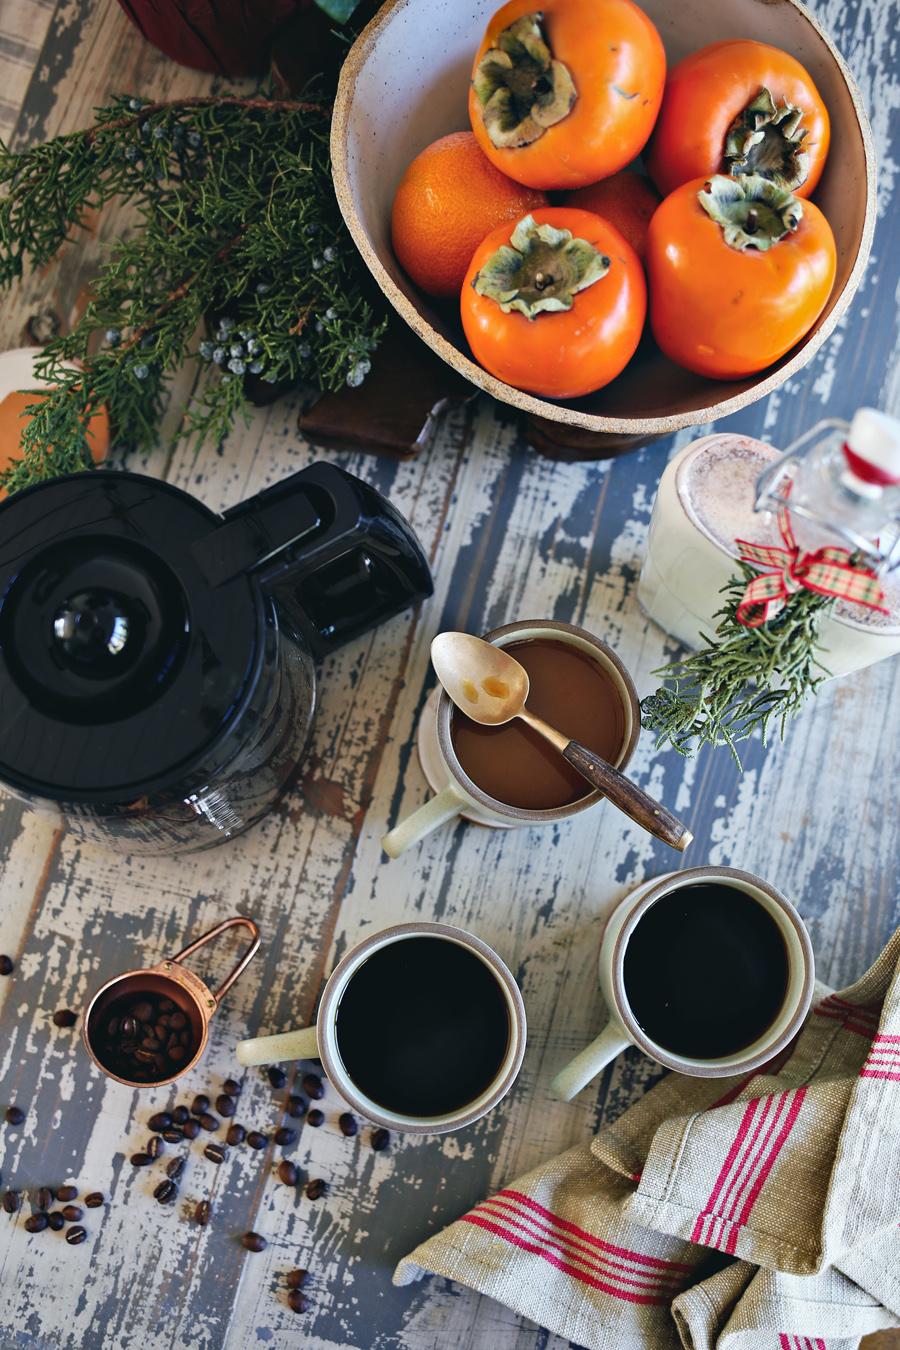 04_Horchata-Coffee-Creamer-Dine-X-Design.jpg